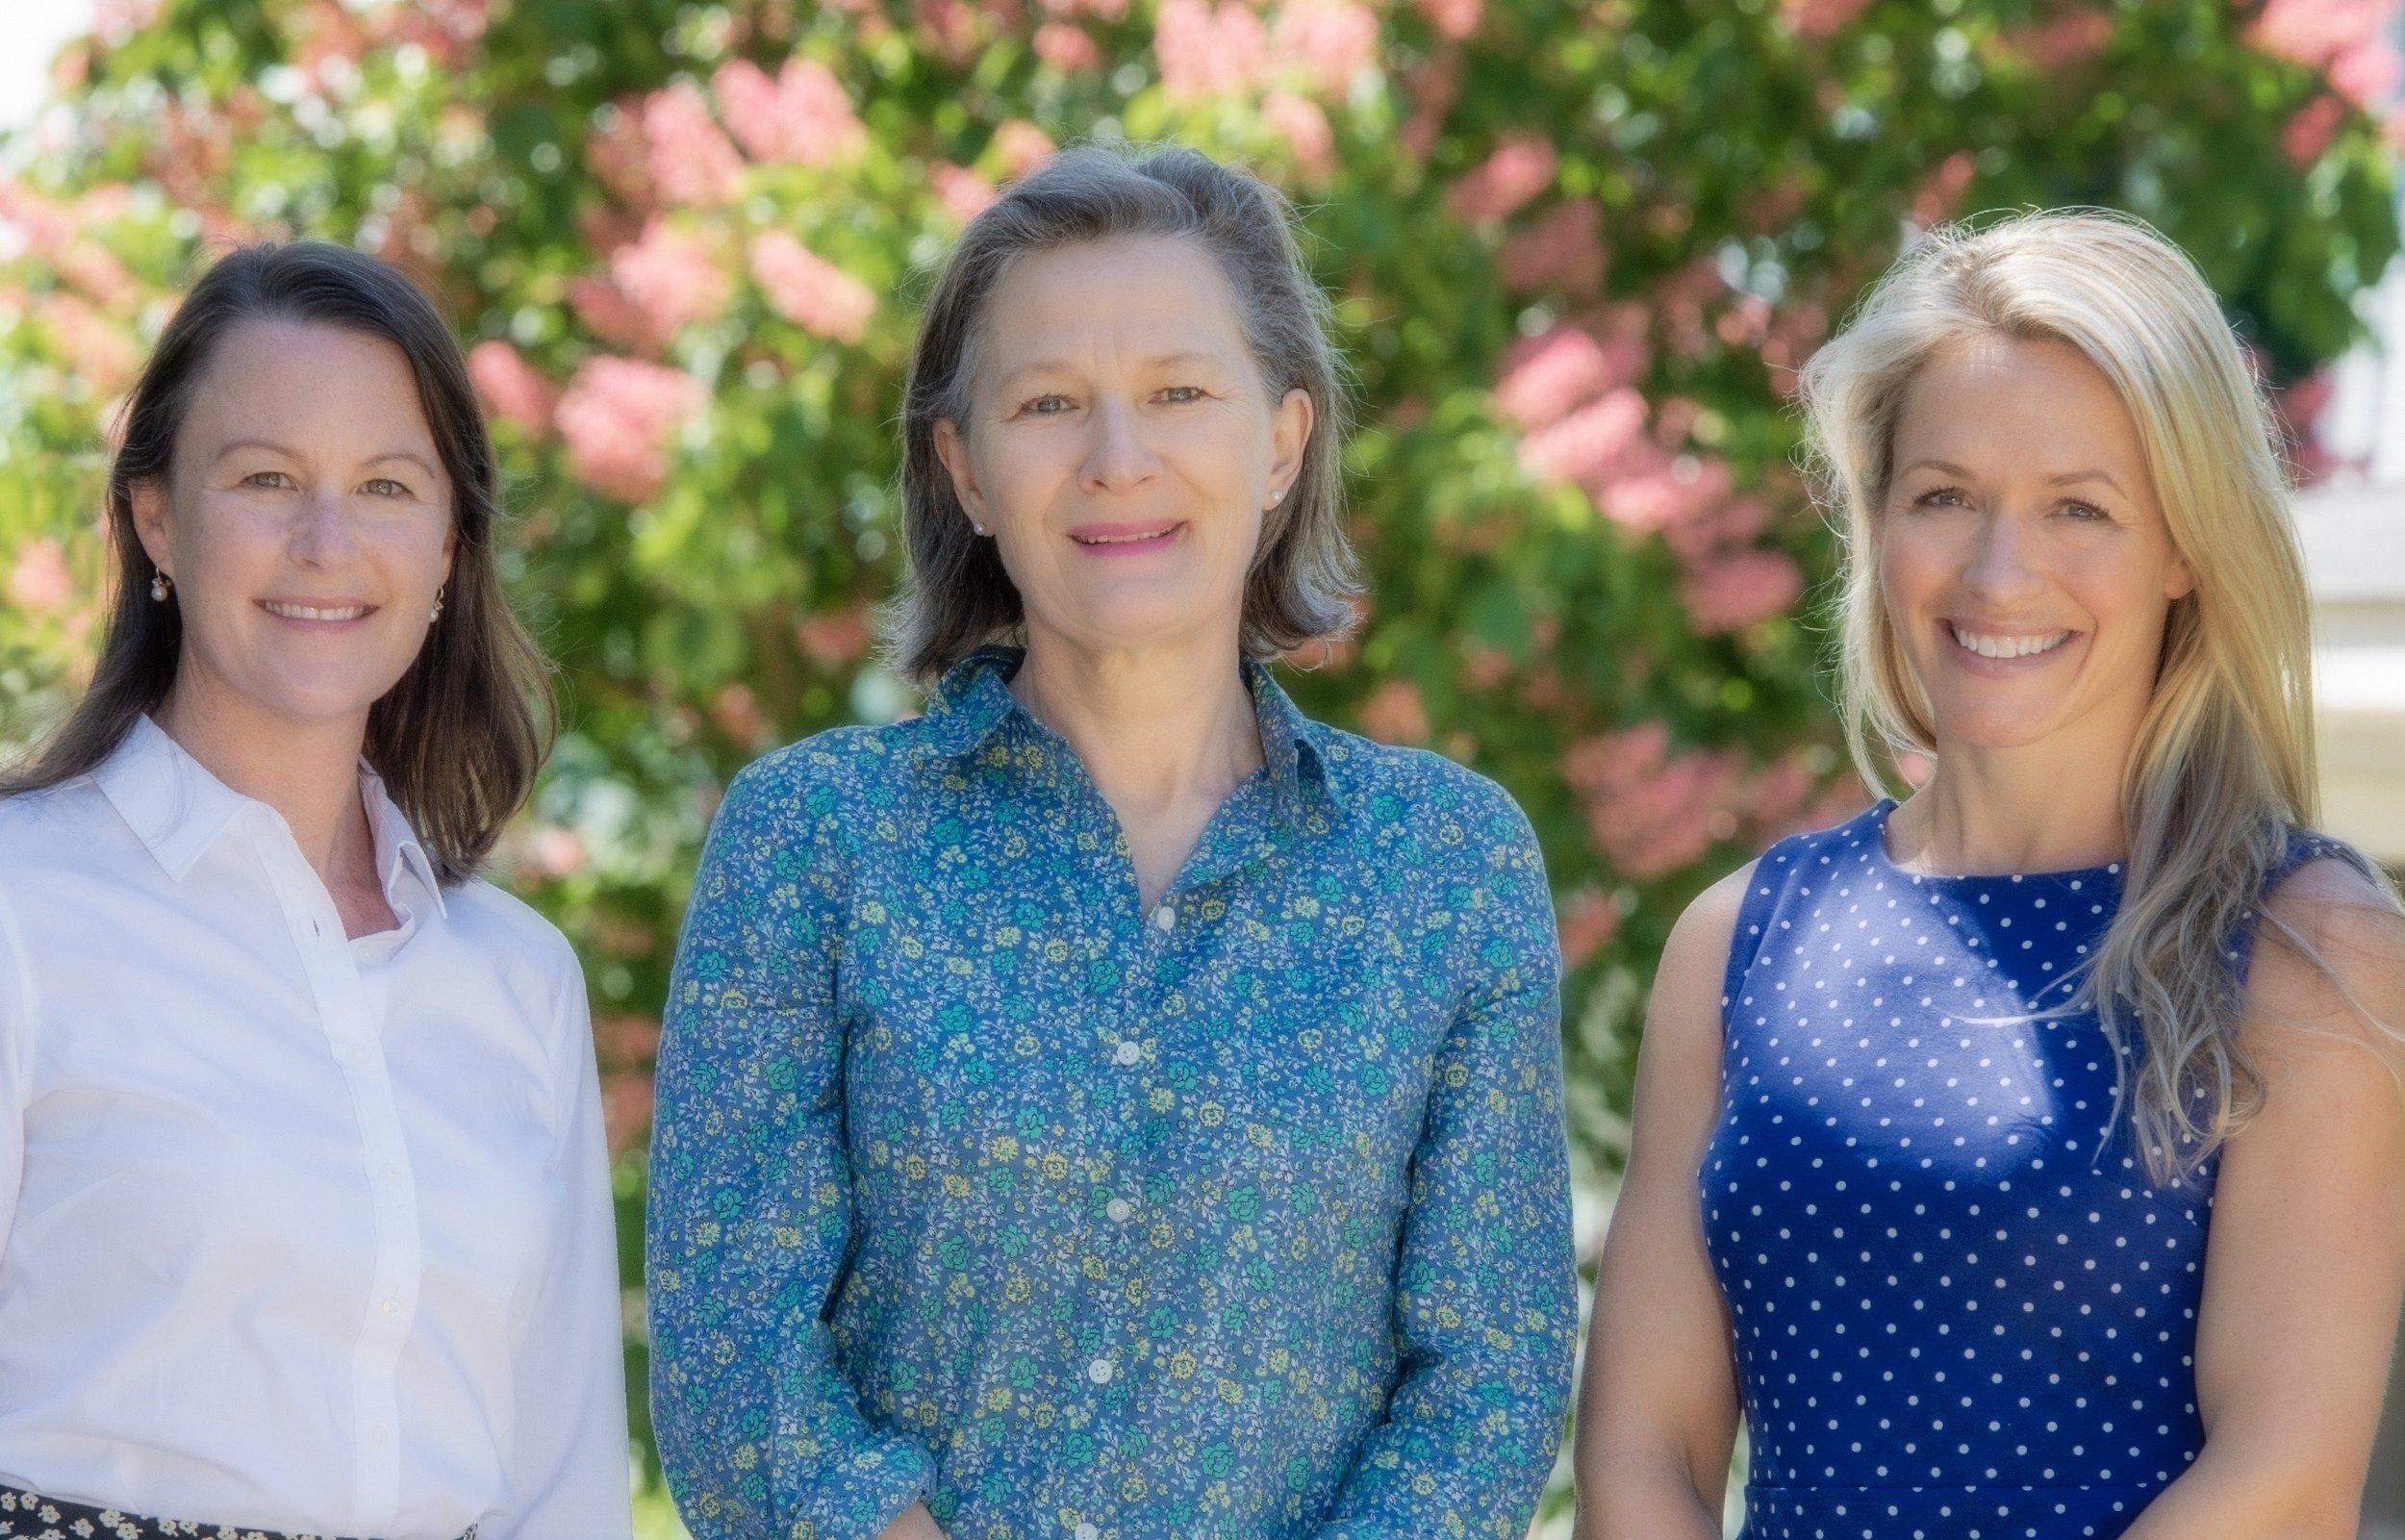 Lisa Soininen, Binni Hackett and Char Glessner